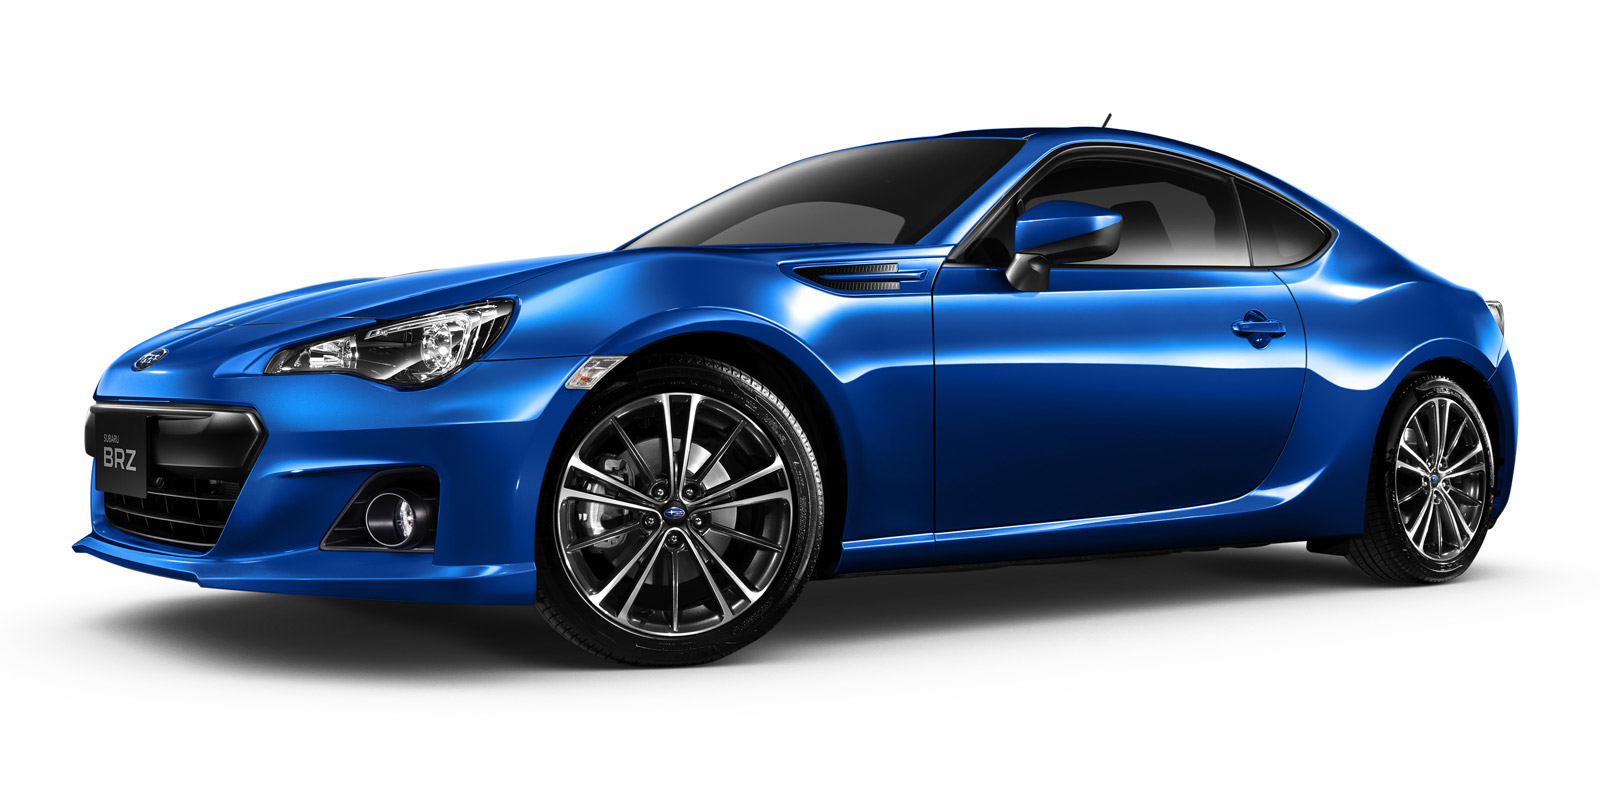 Second Generation Brz Coming Says Boss Of Subaru S Parent Company